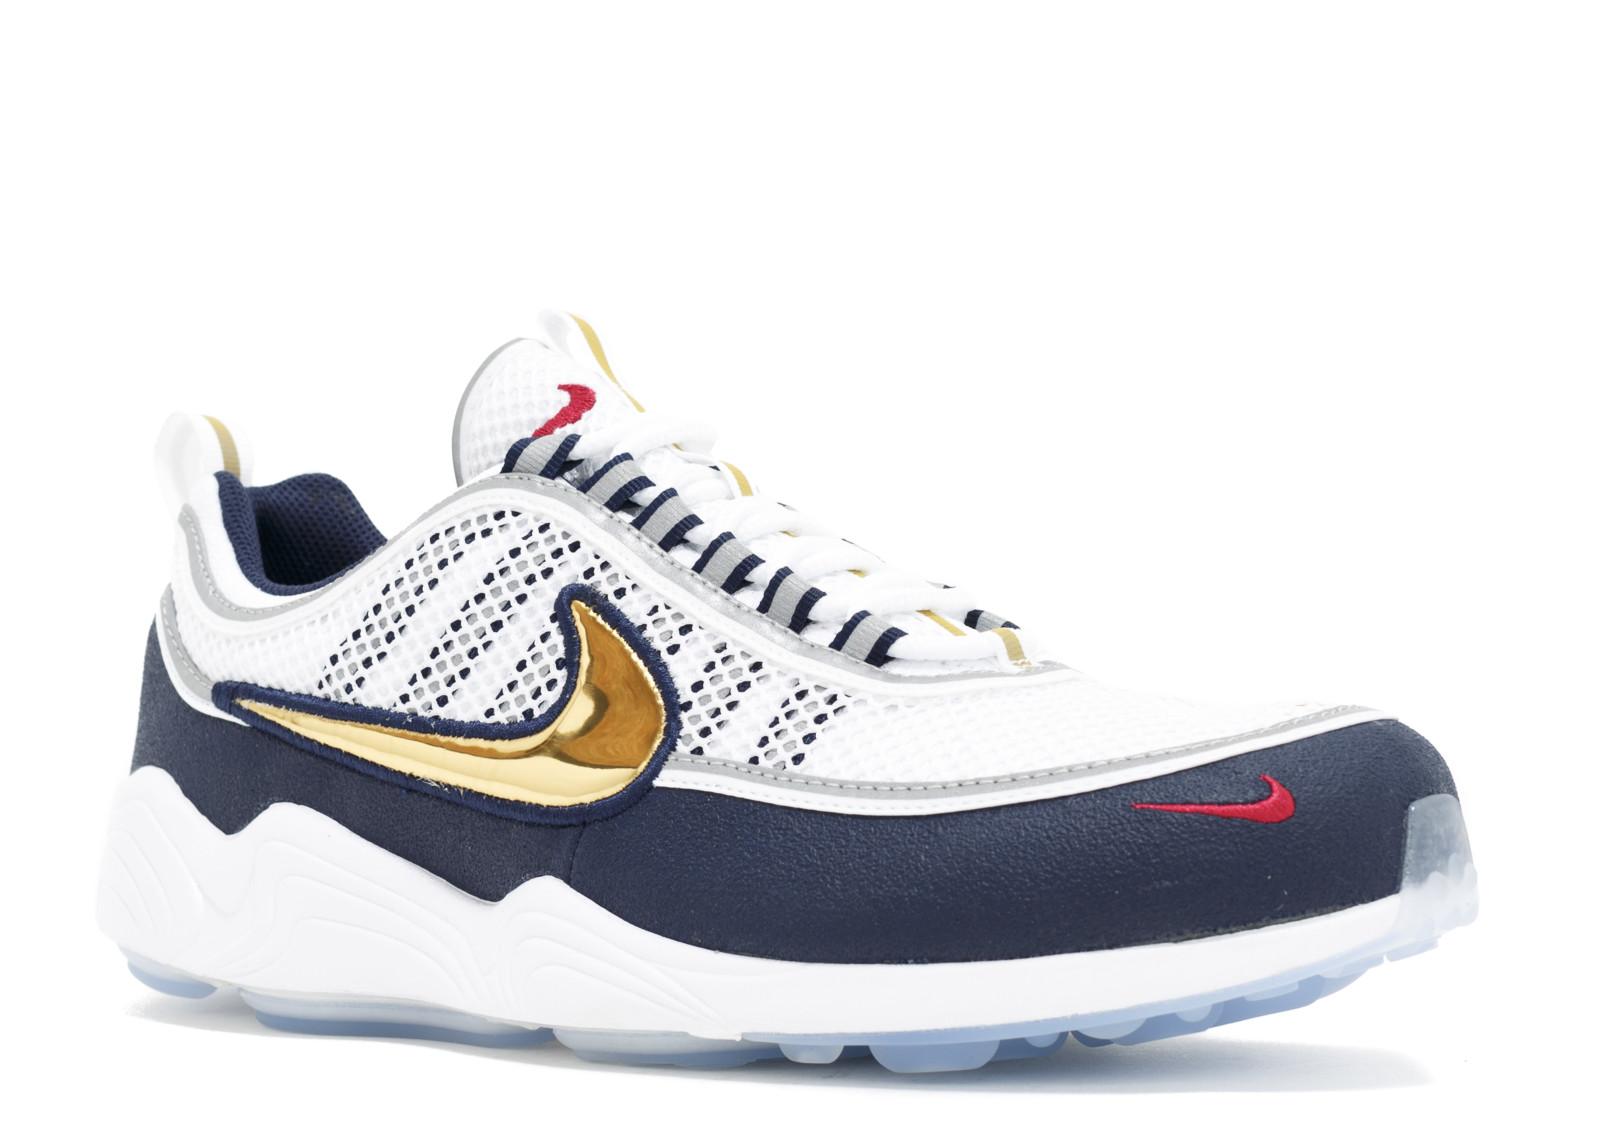 aaa4efb0dee5 Nike - Men - Air Zoom Spiridon  Olympic  - 849776-174 - Size 9.5